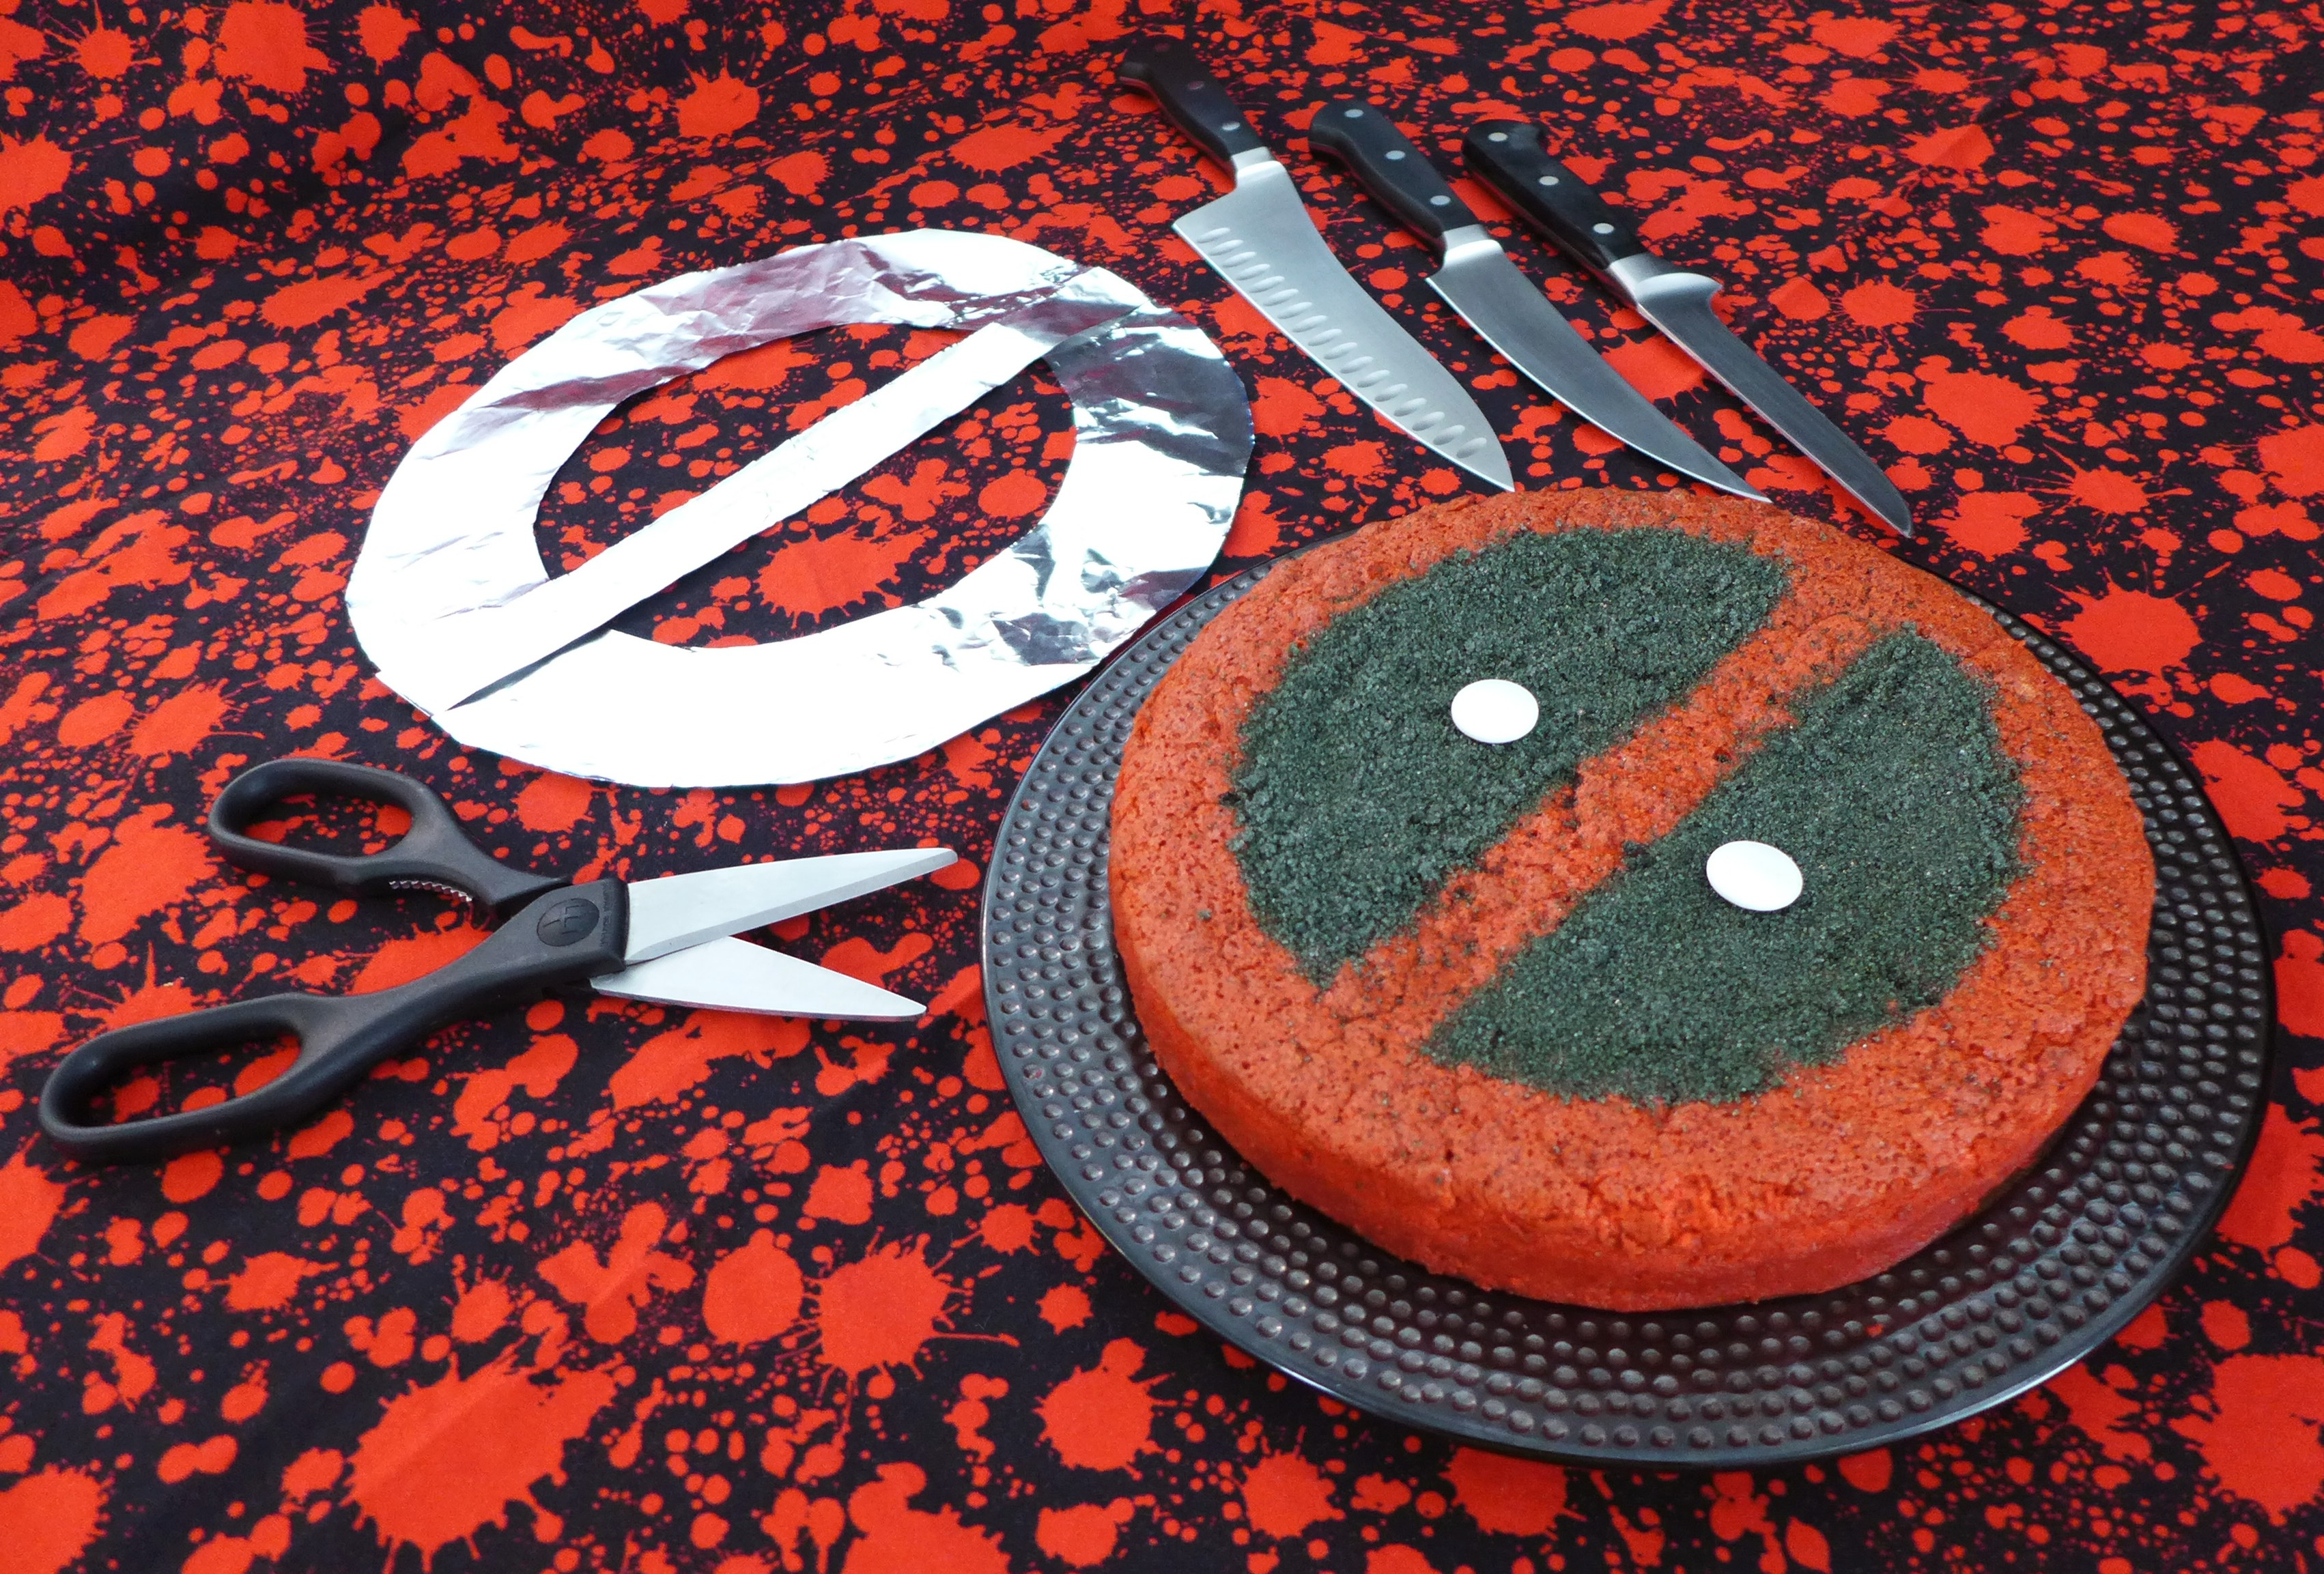 Kitchen Overlord's Deadpool Magic Cake 01